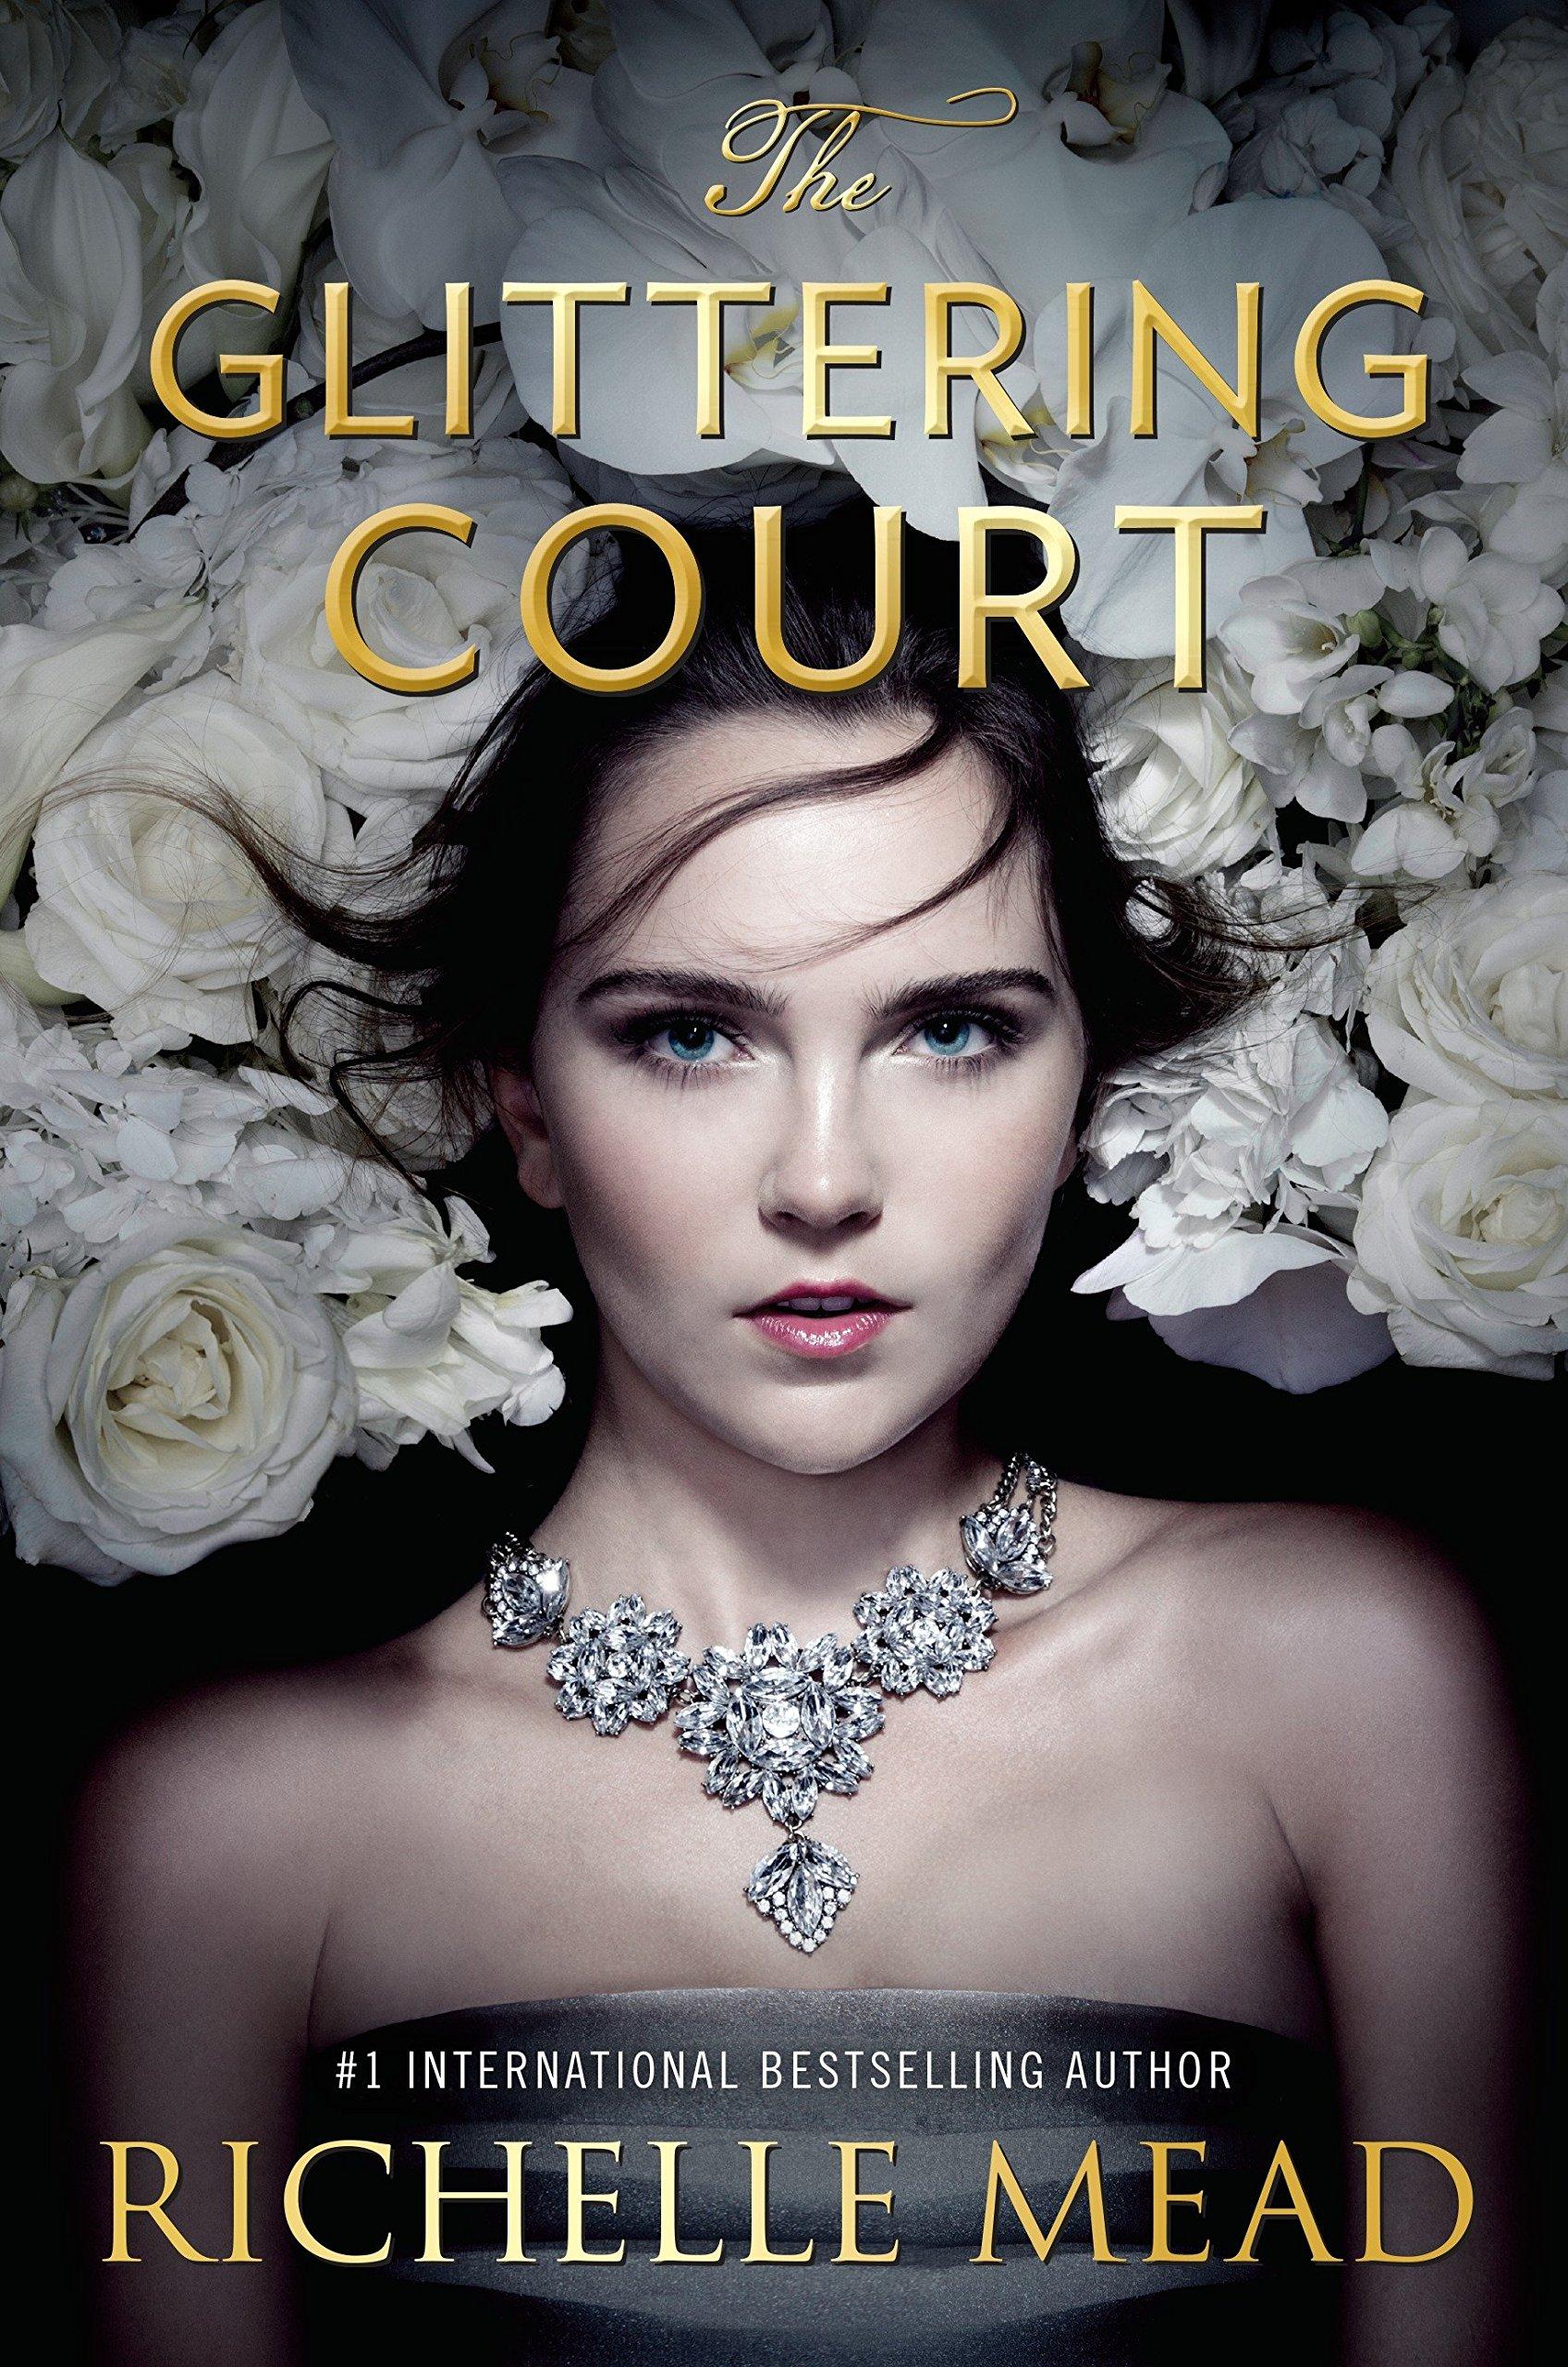 The Glittering Court - Livros na Amazon Brasil- 9781595148414